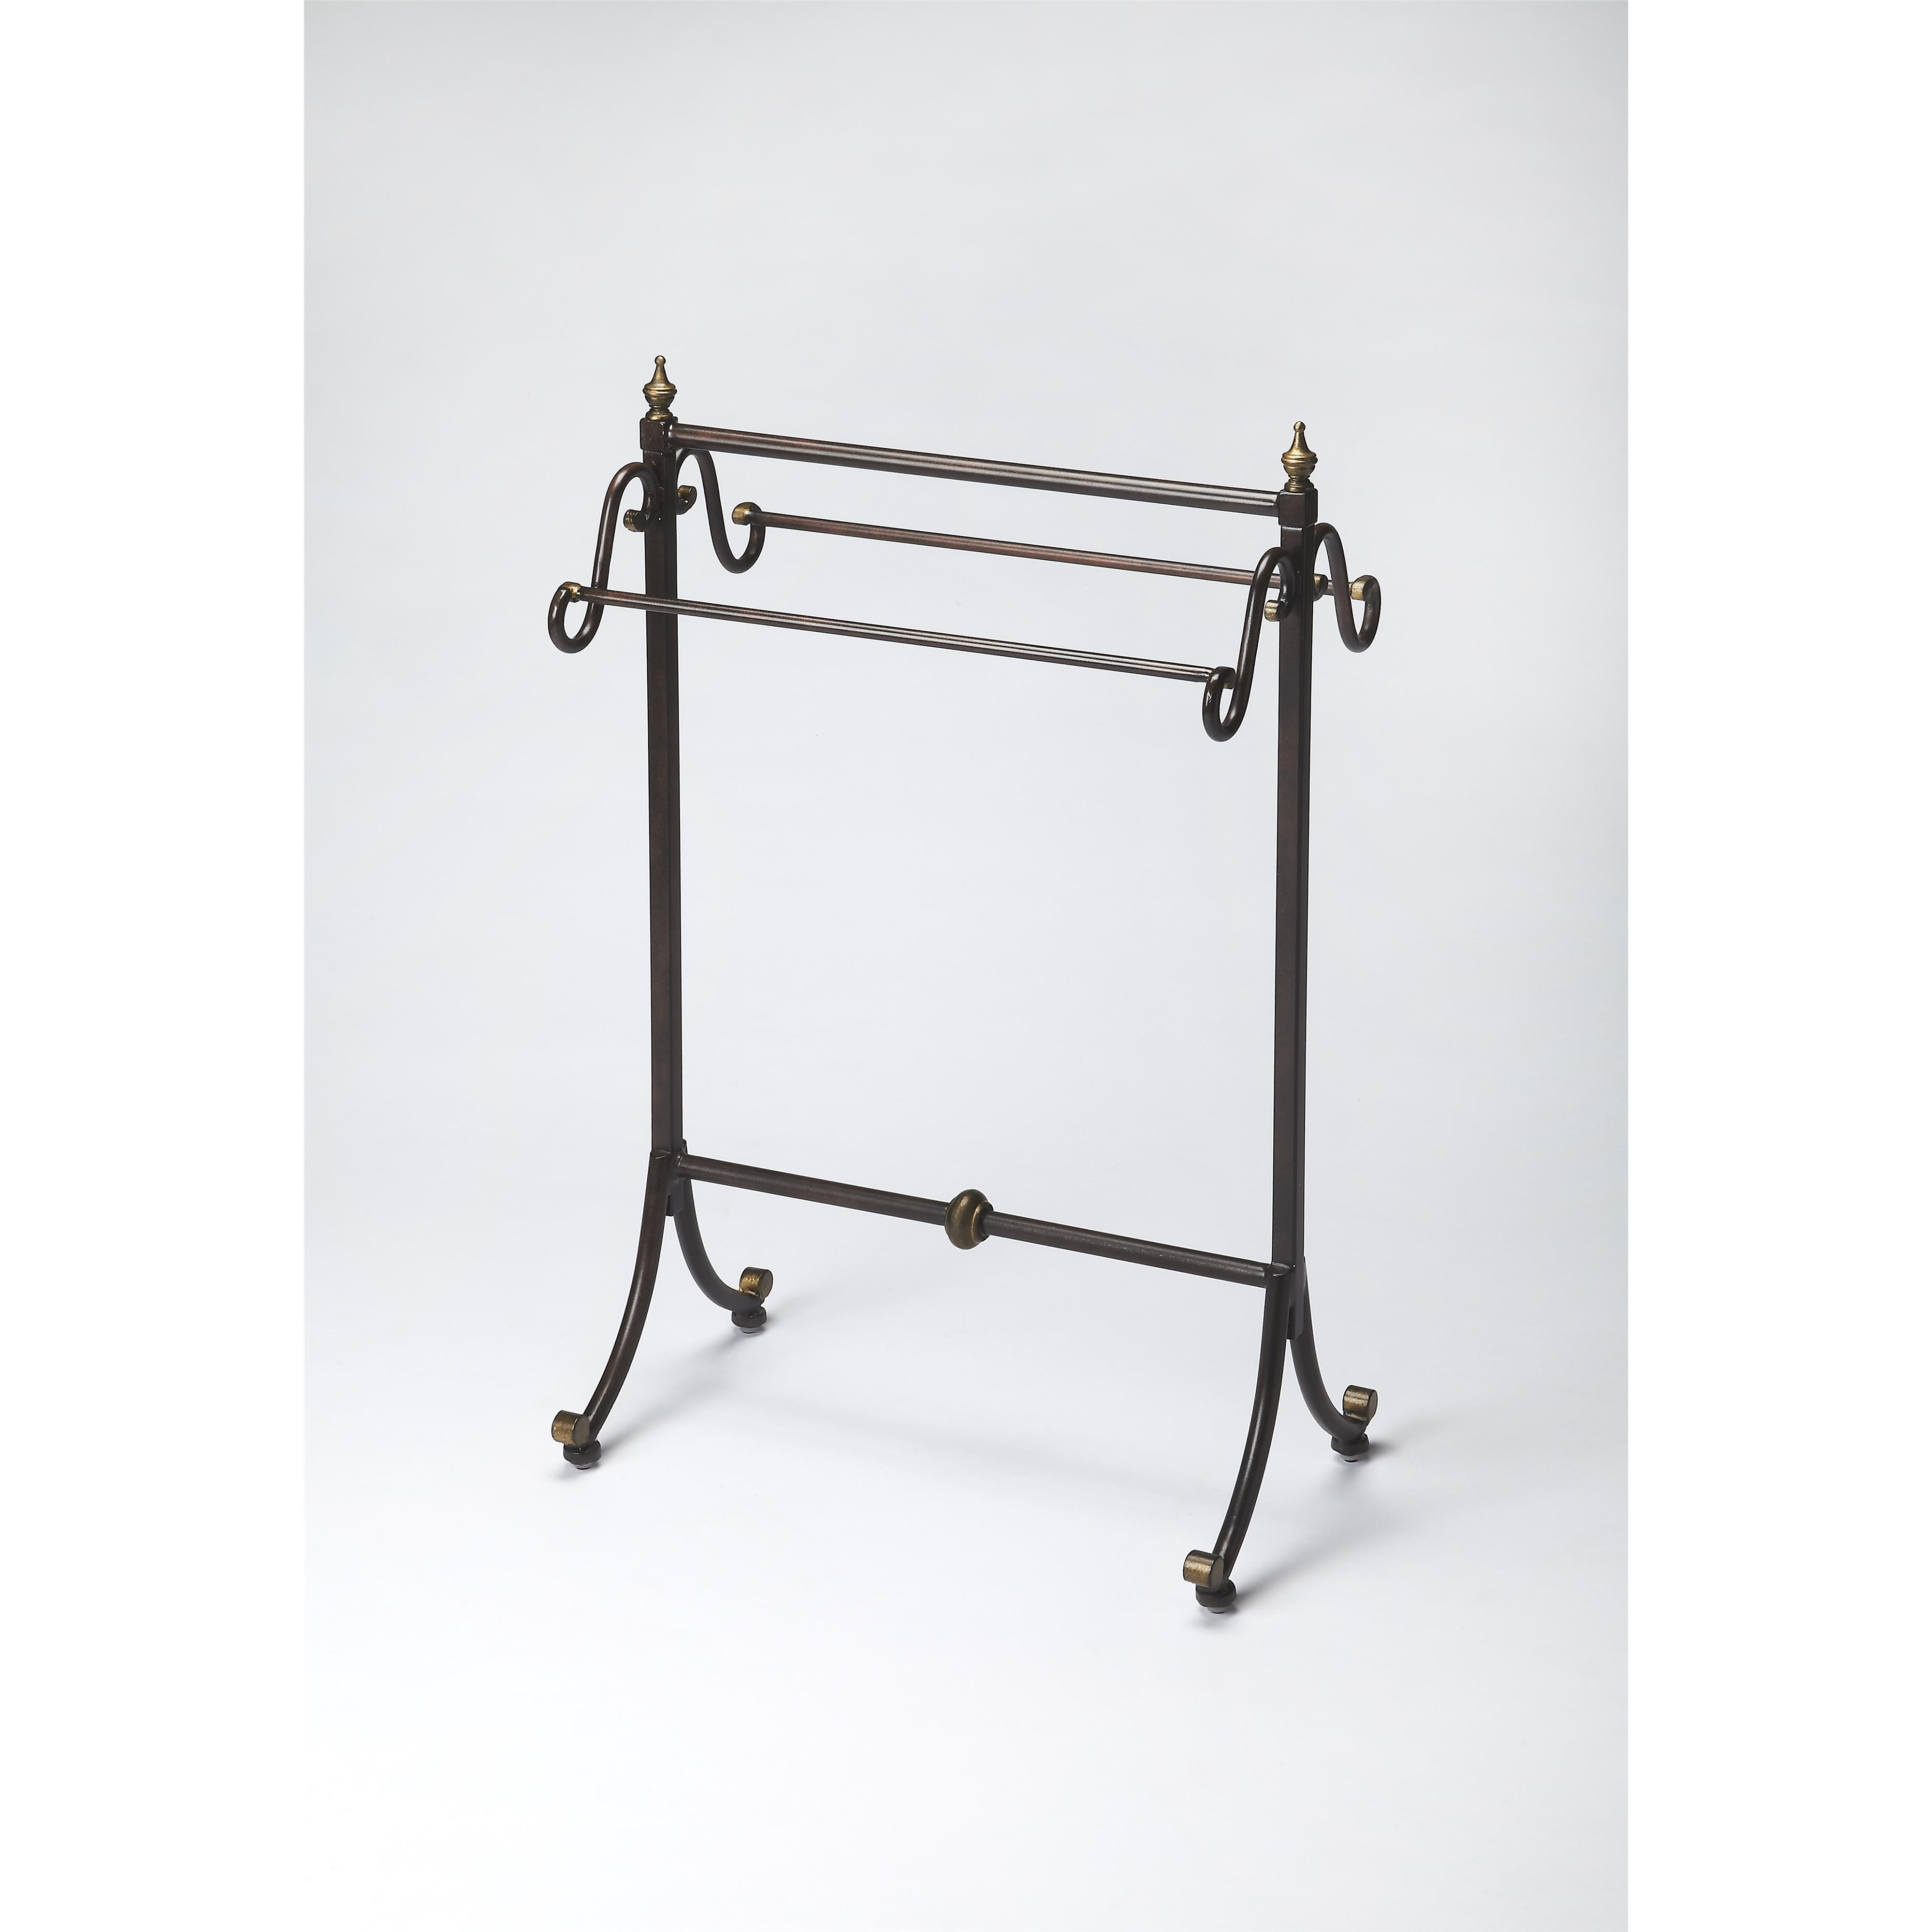 Butler Specialty Company Metalworks Blanket Stand - Item Number: 3501025